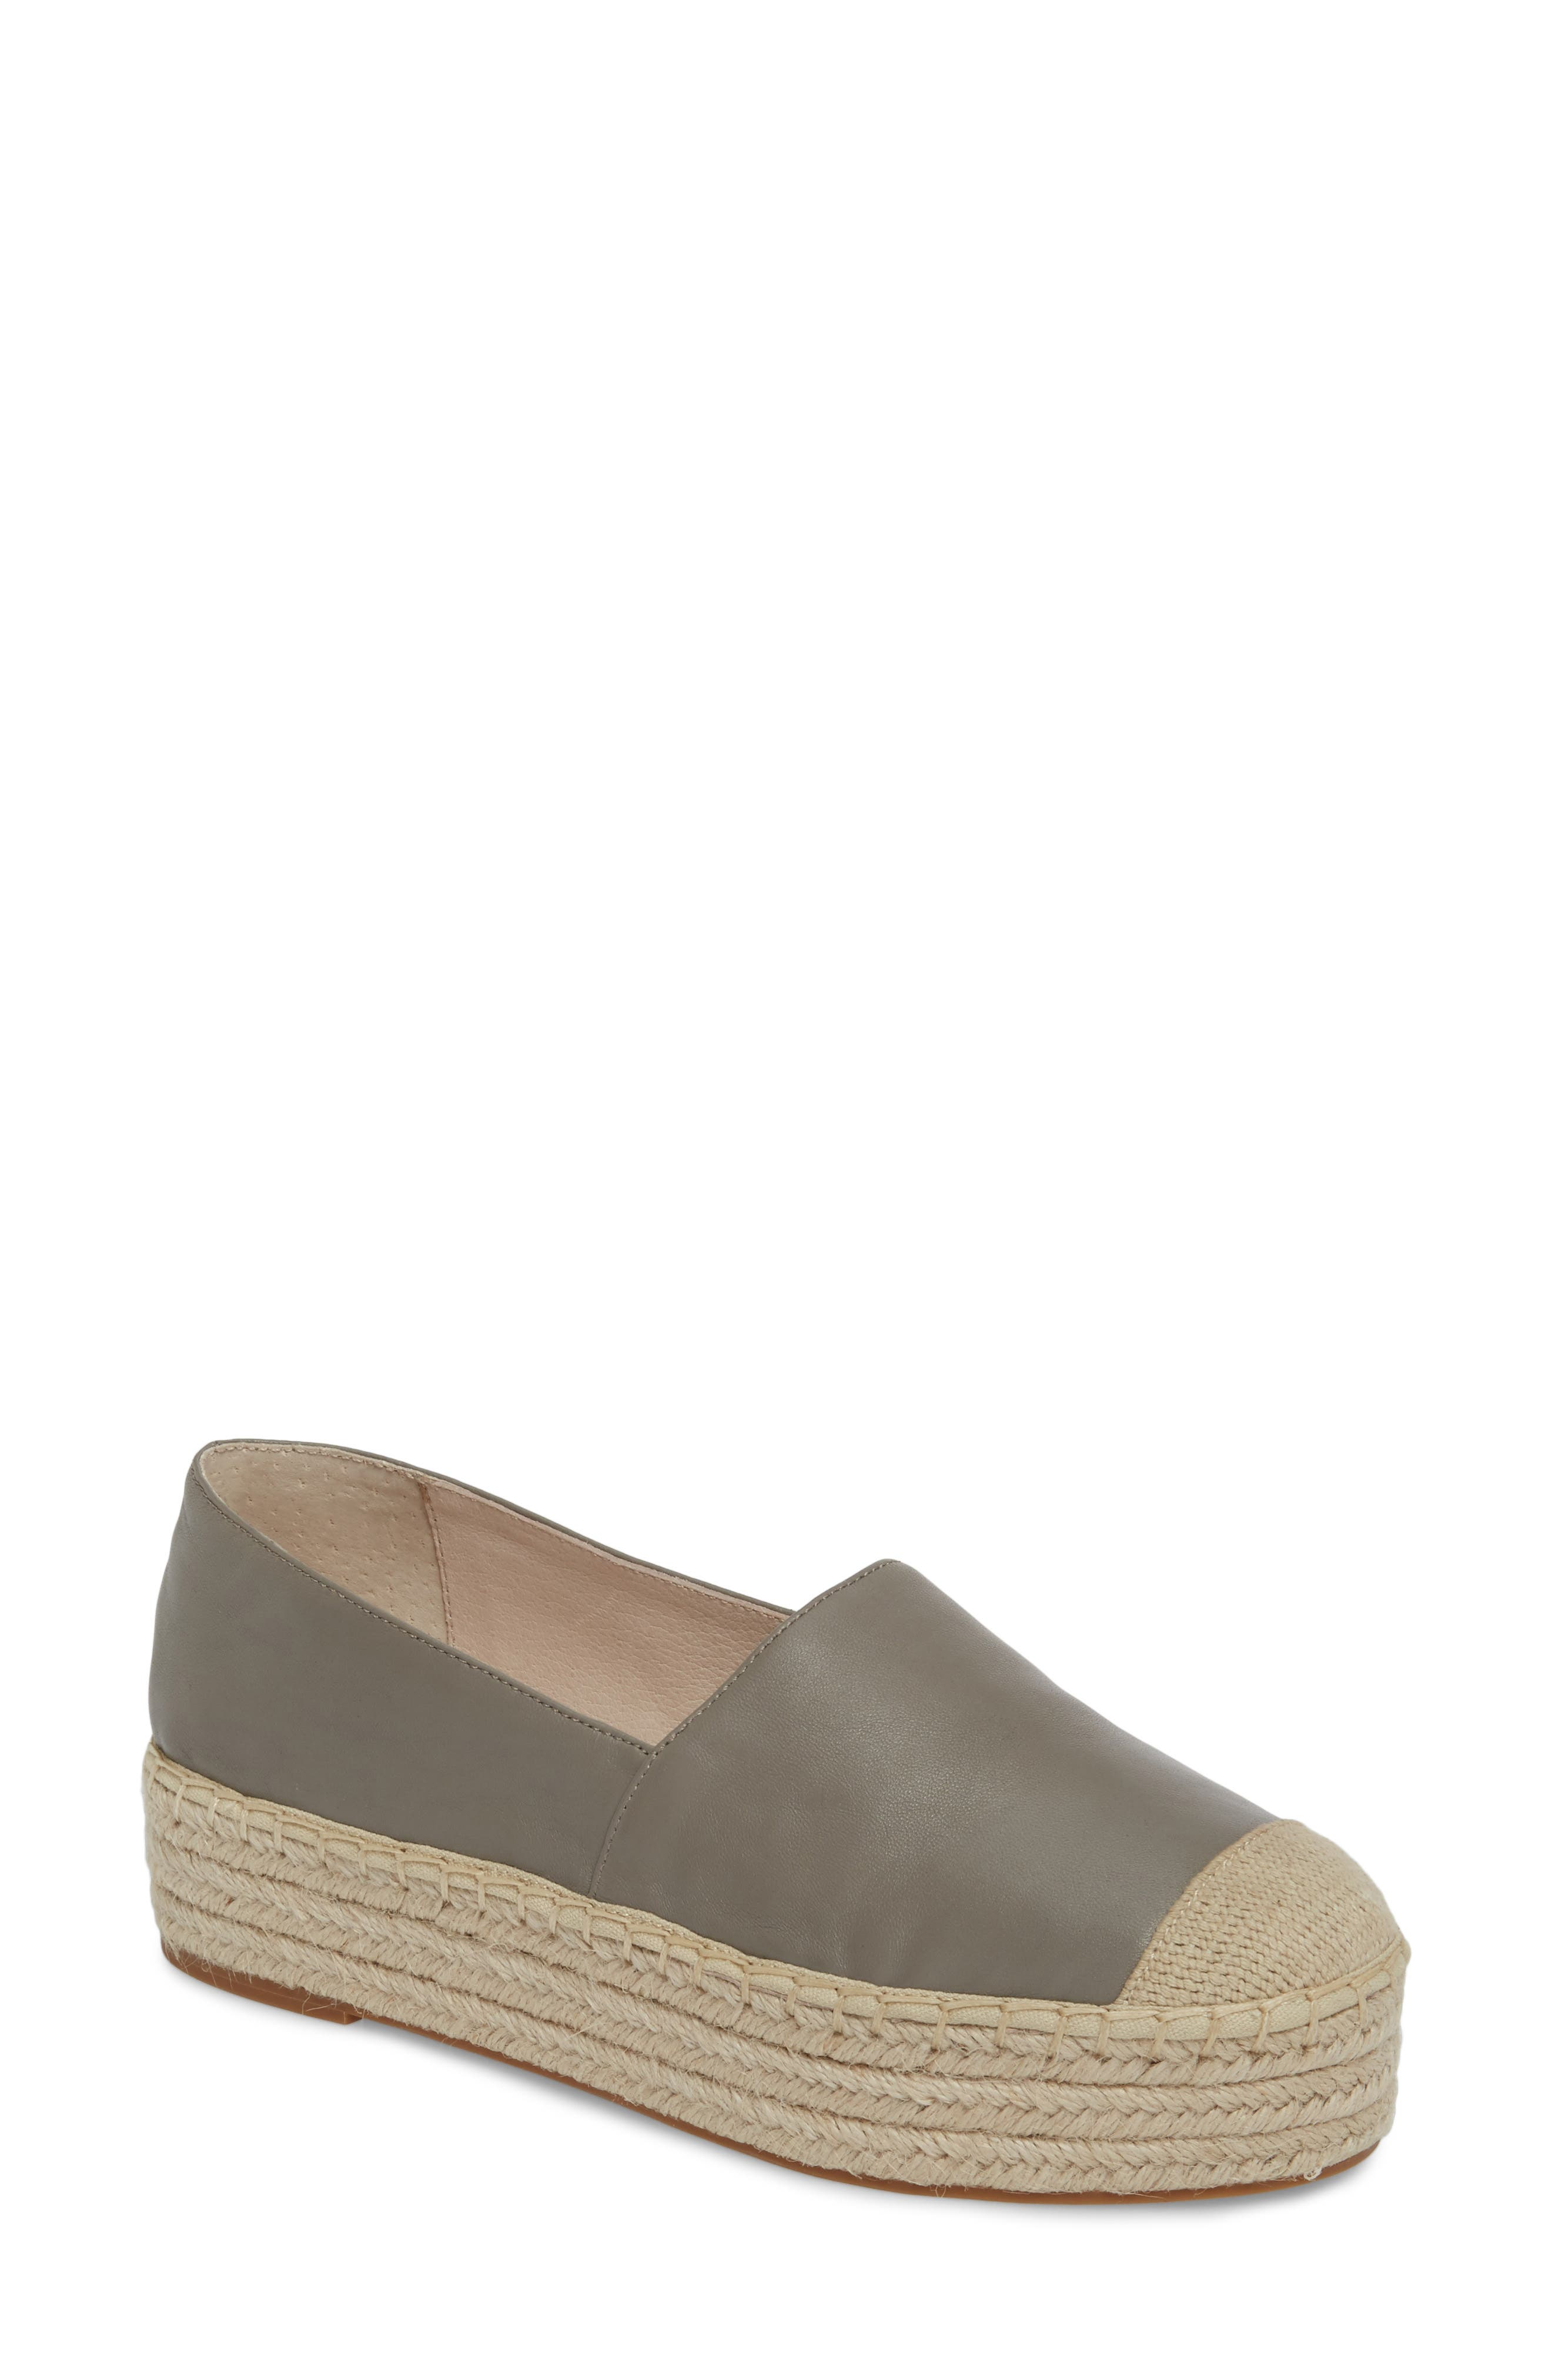 Collins Lea Espadrille Platform Slip-On,                         Main,                         color, Grey Leather